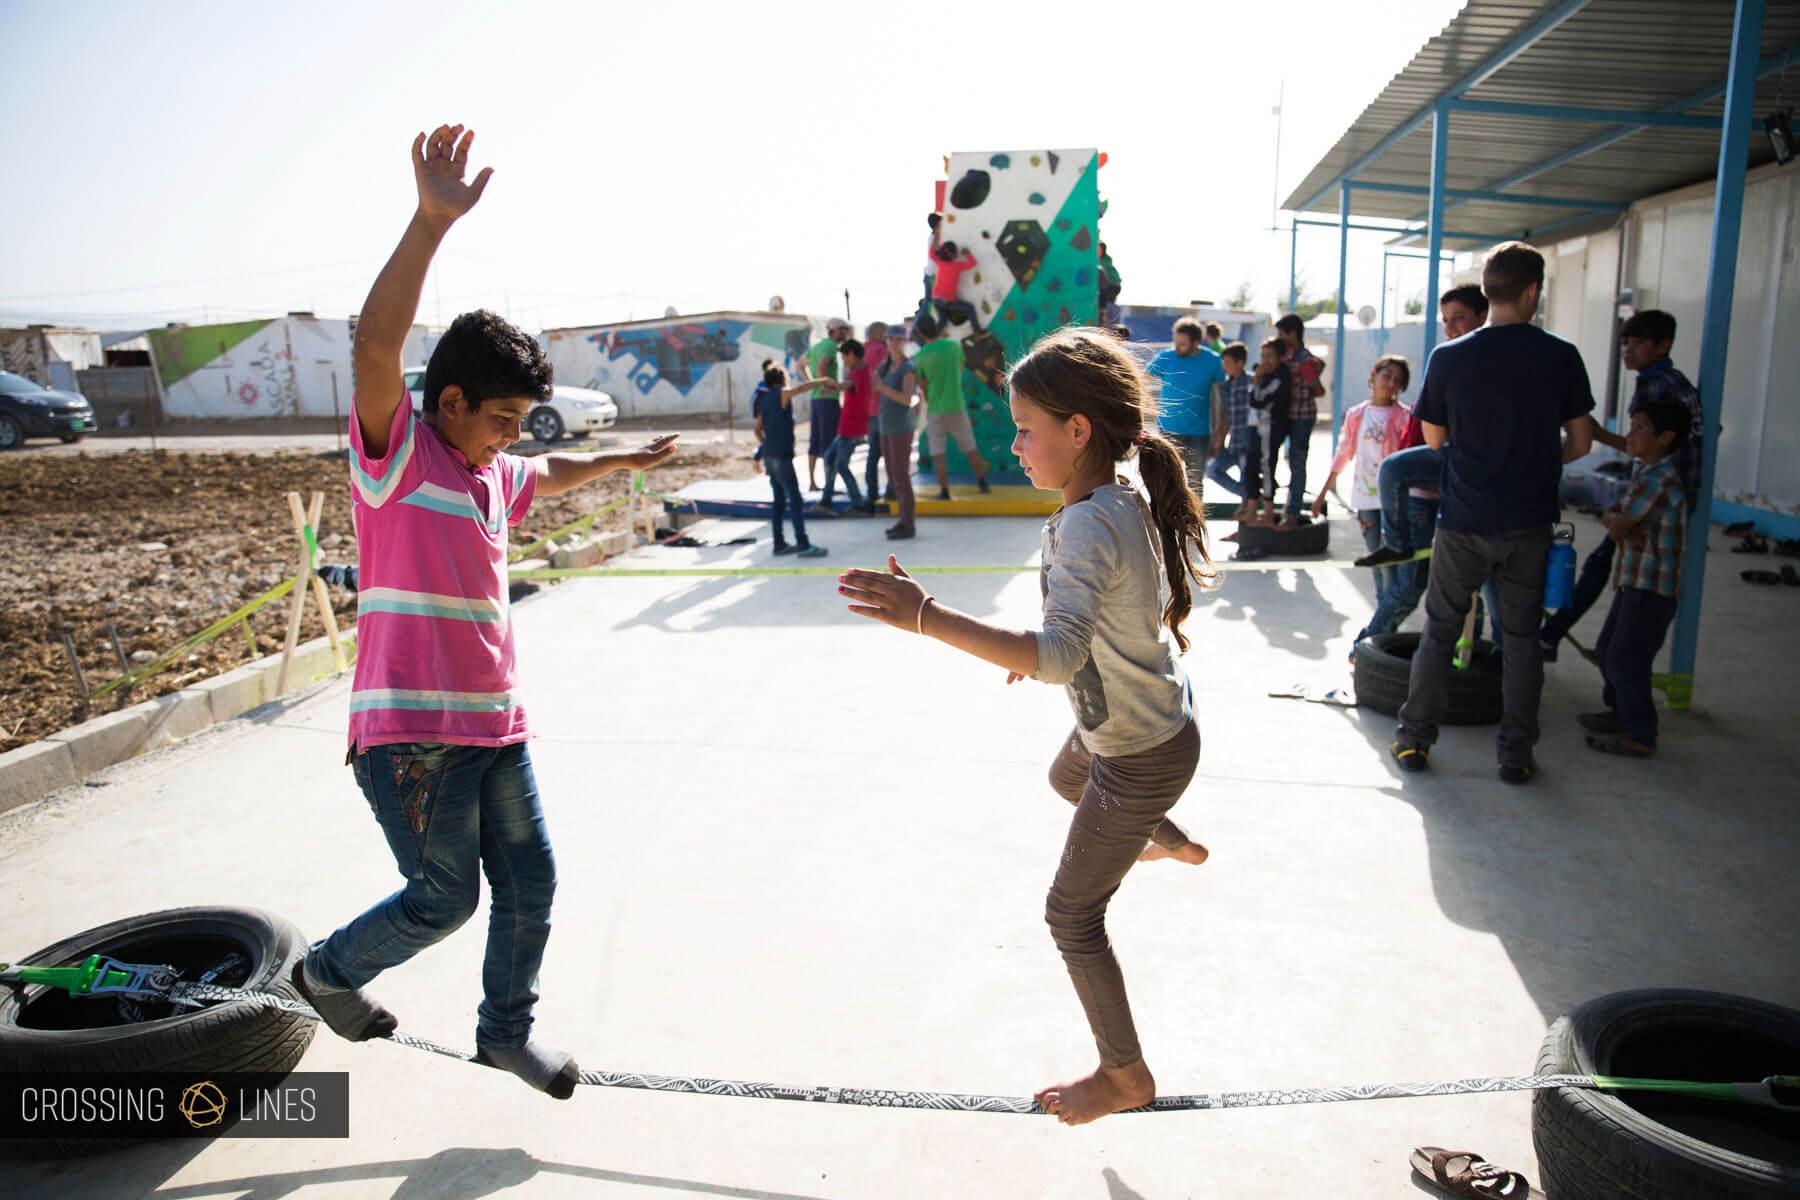 Crossing Lines Lebanon Teaching Day 2 Two kids